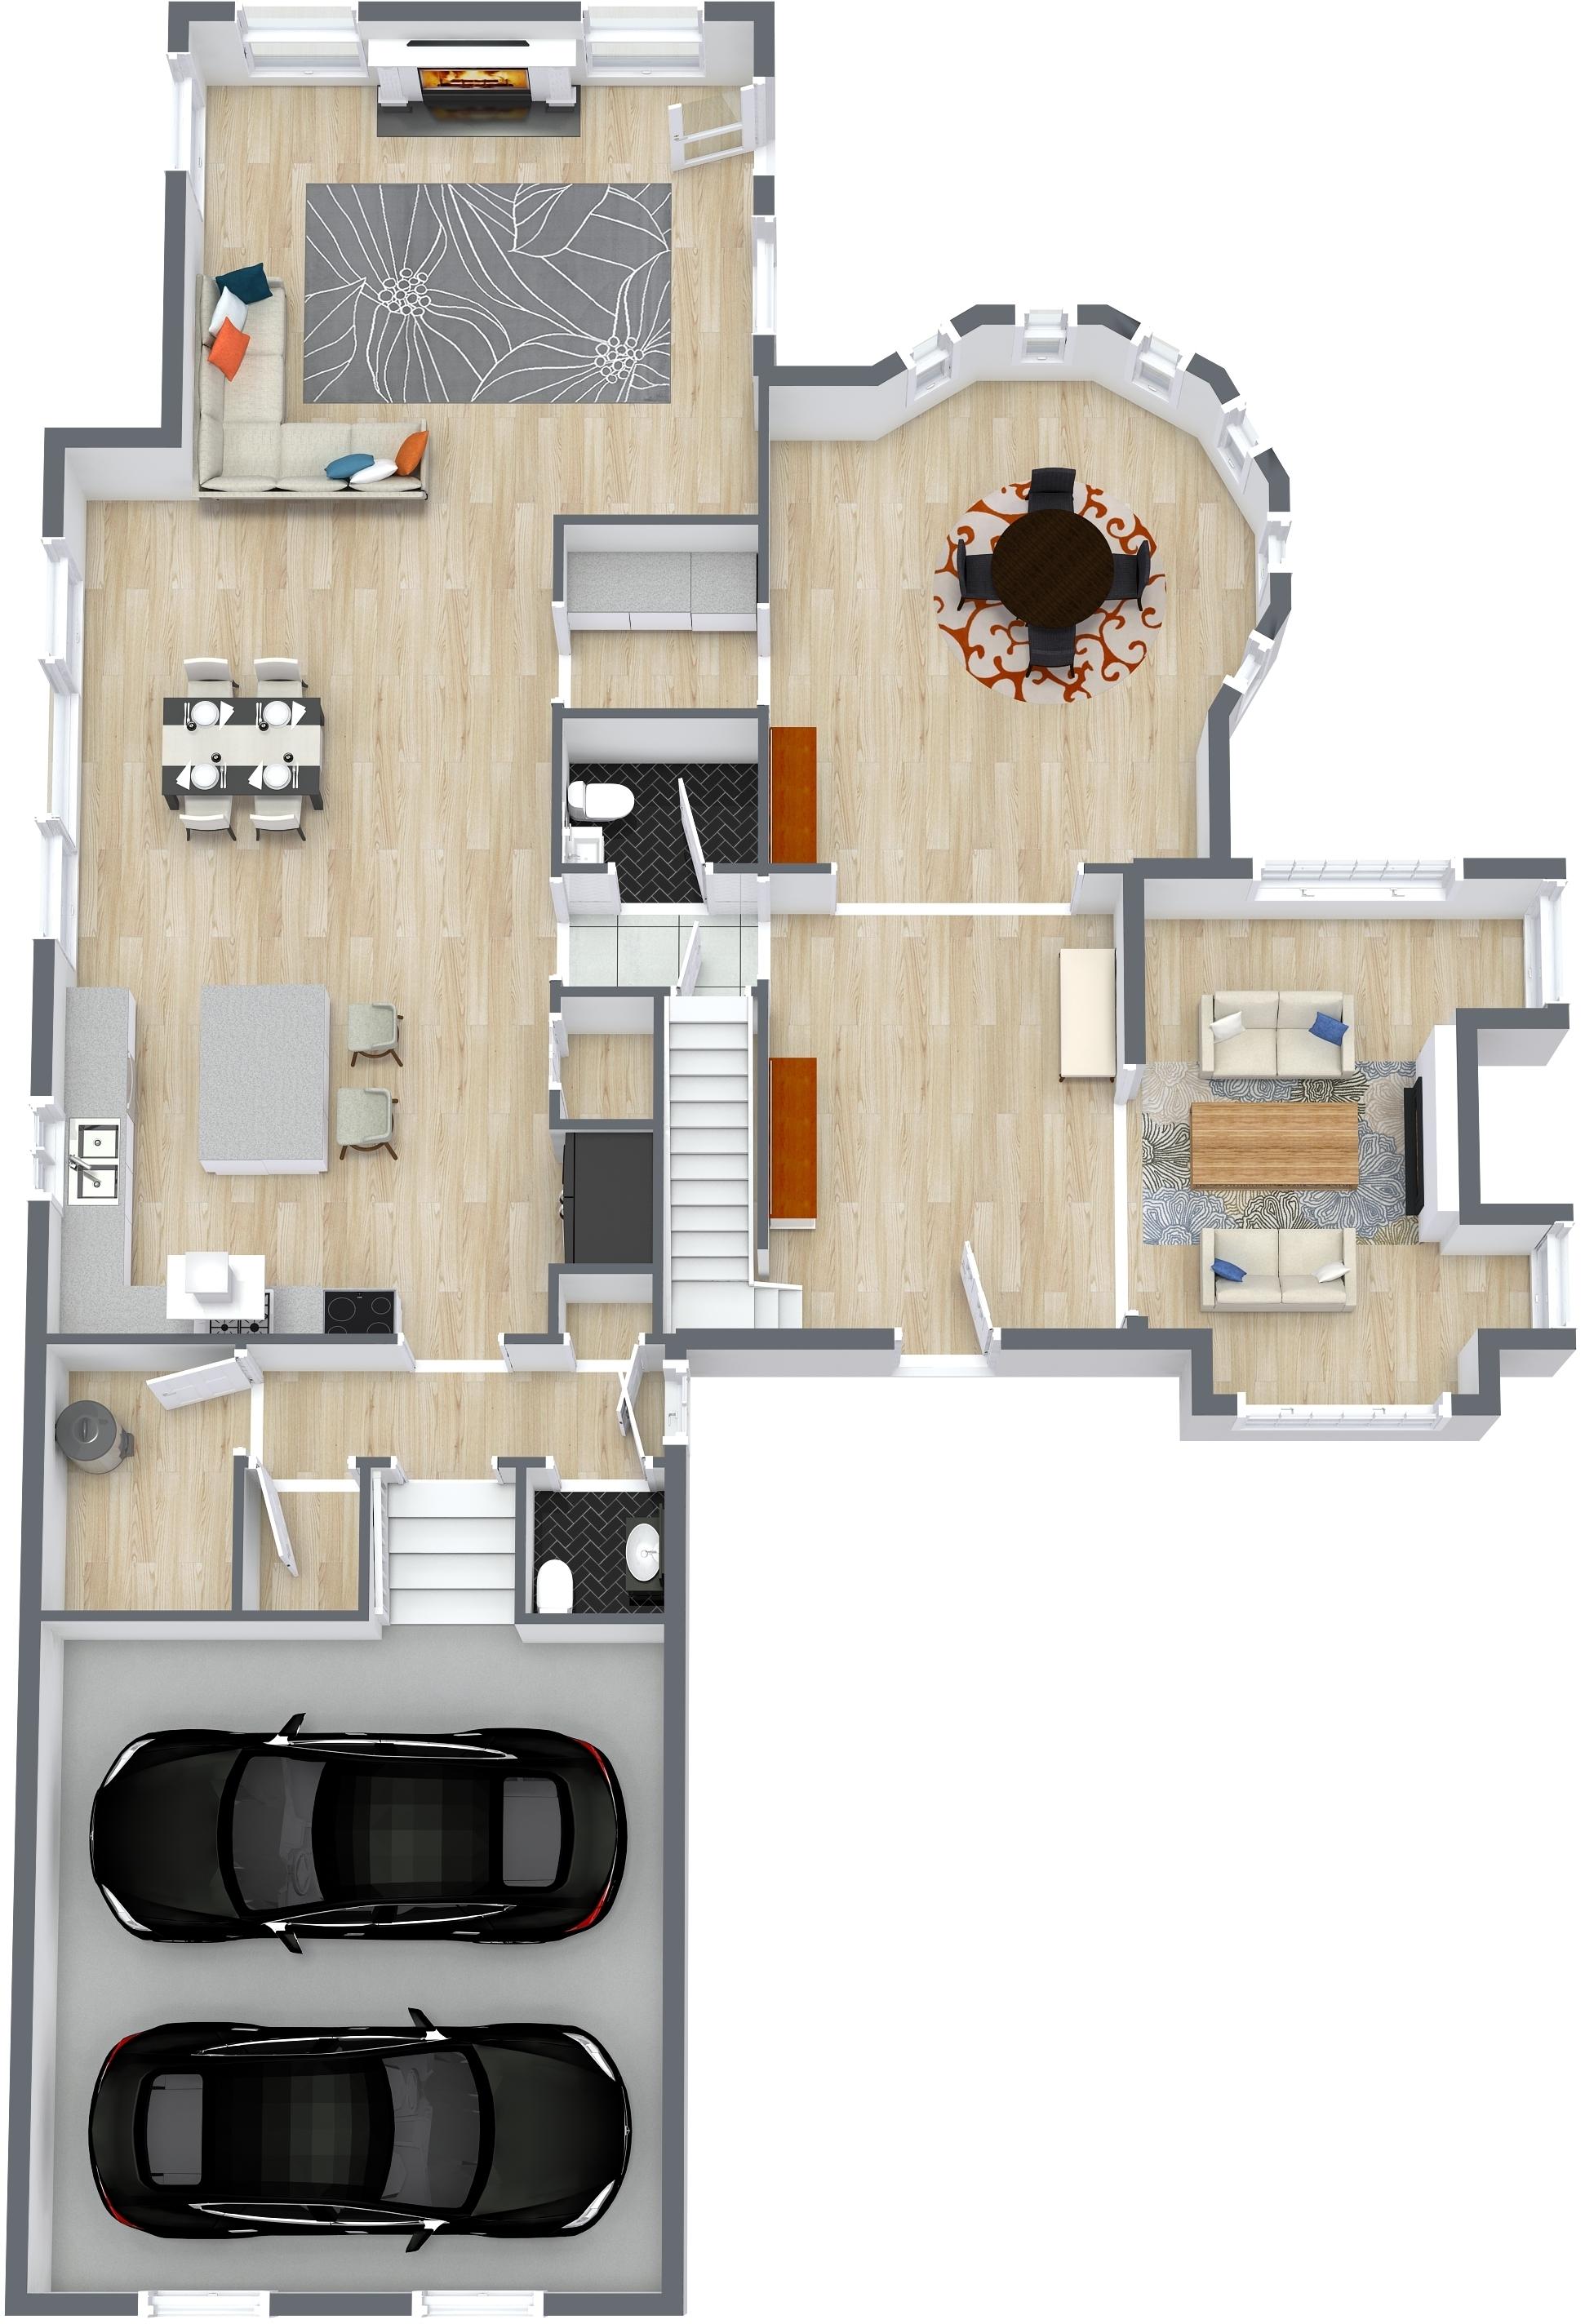 fairfield - 1. Floor - 3D Floor Plan.jpg